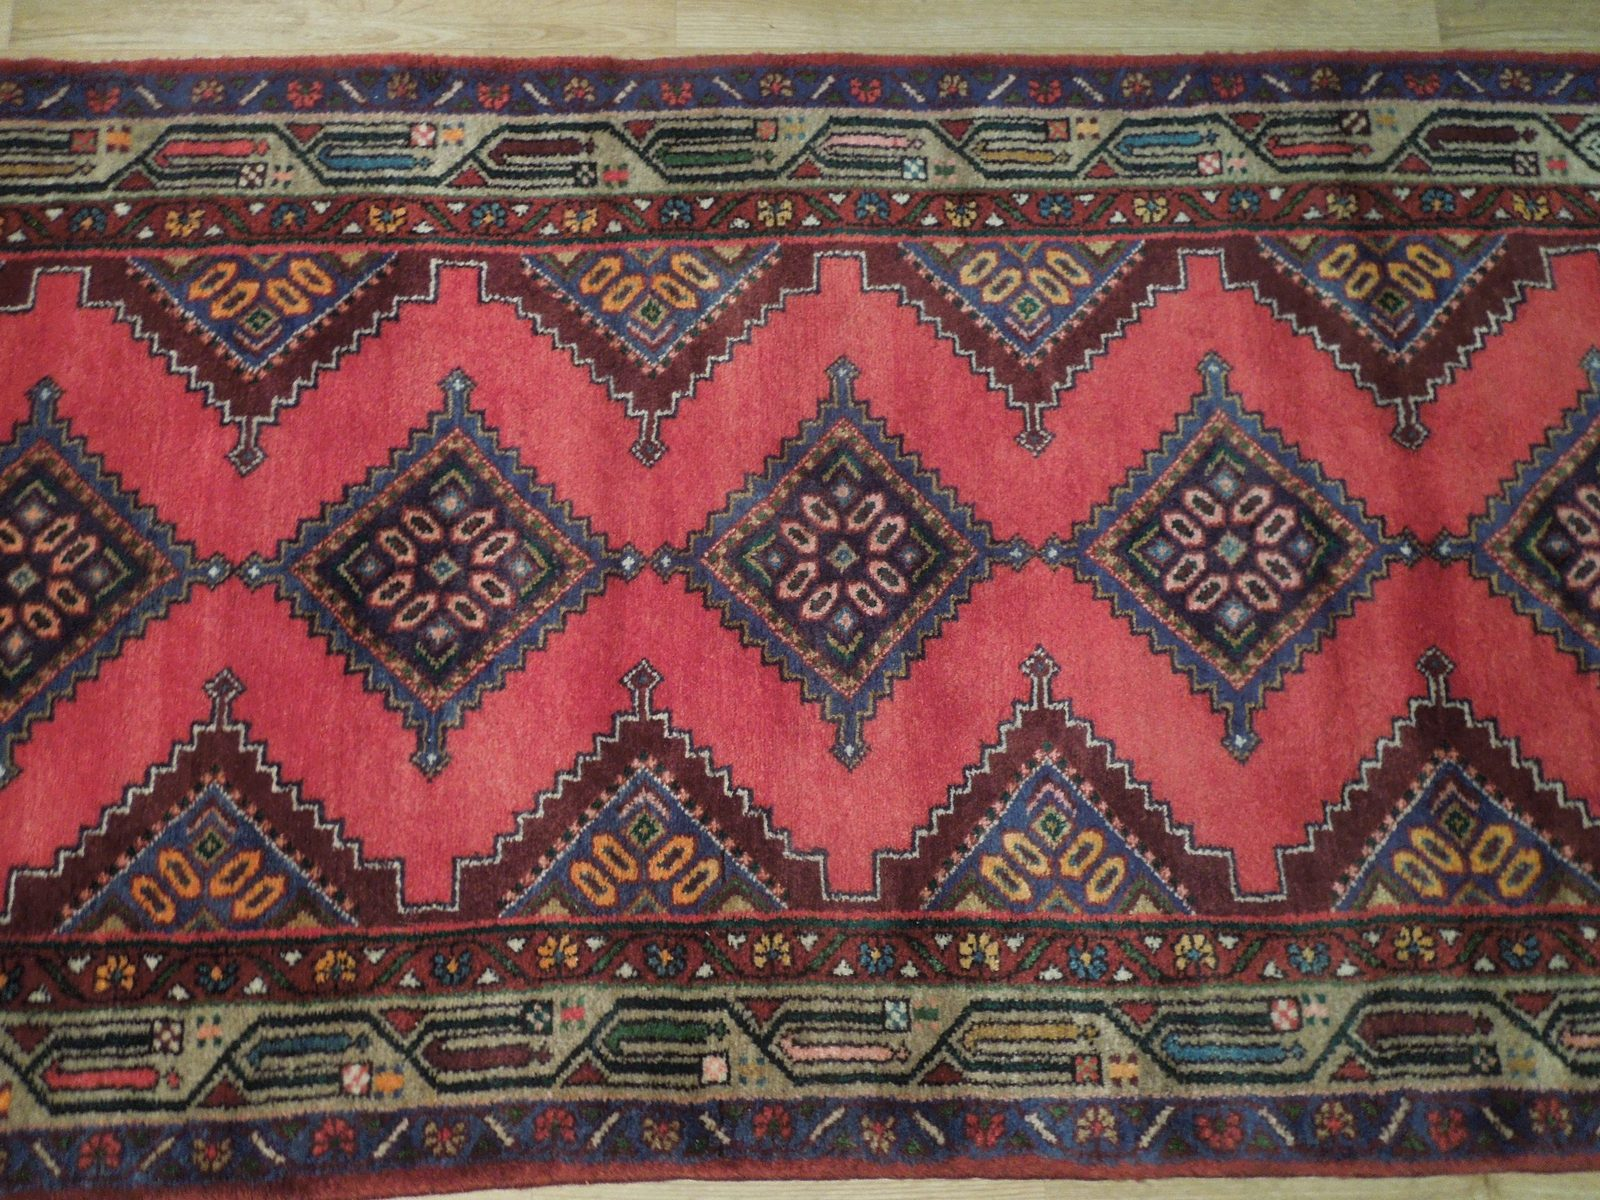 Pink Hamadan Persian Wool Handmade Rug 3x9 All-Over Geometric Rug image 6